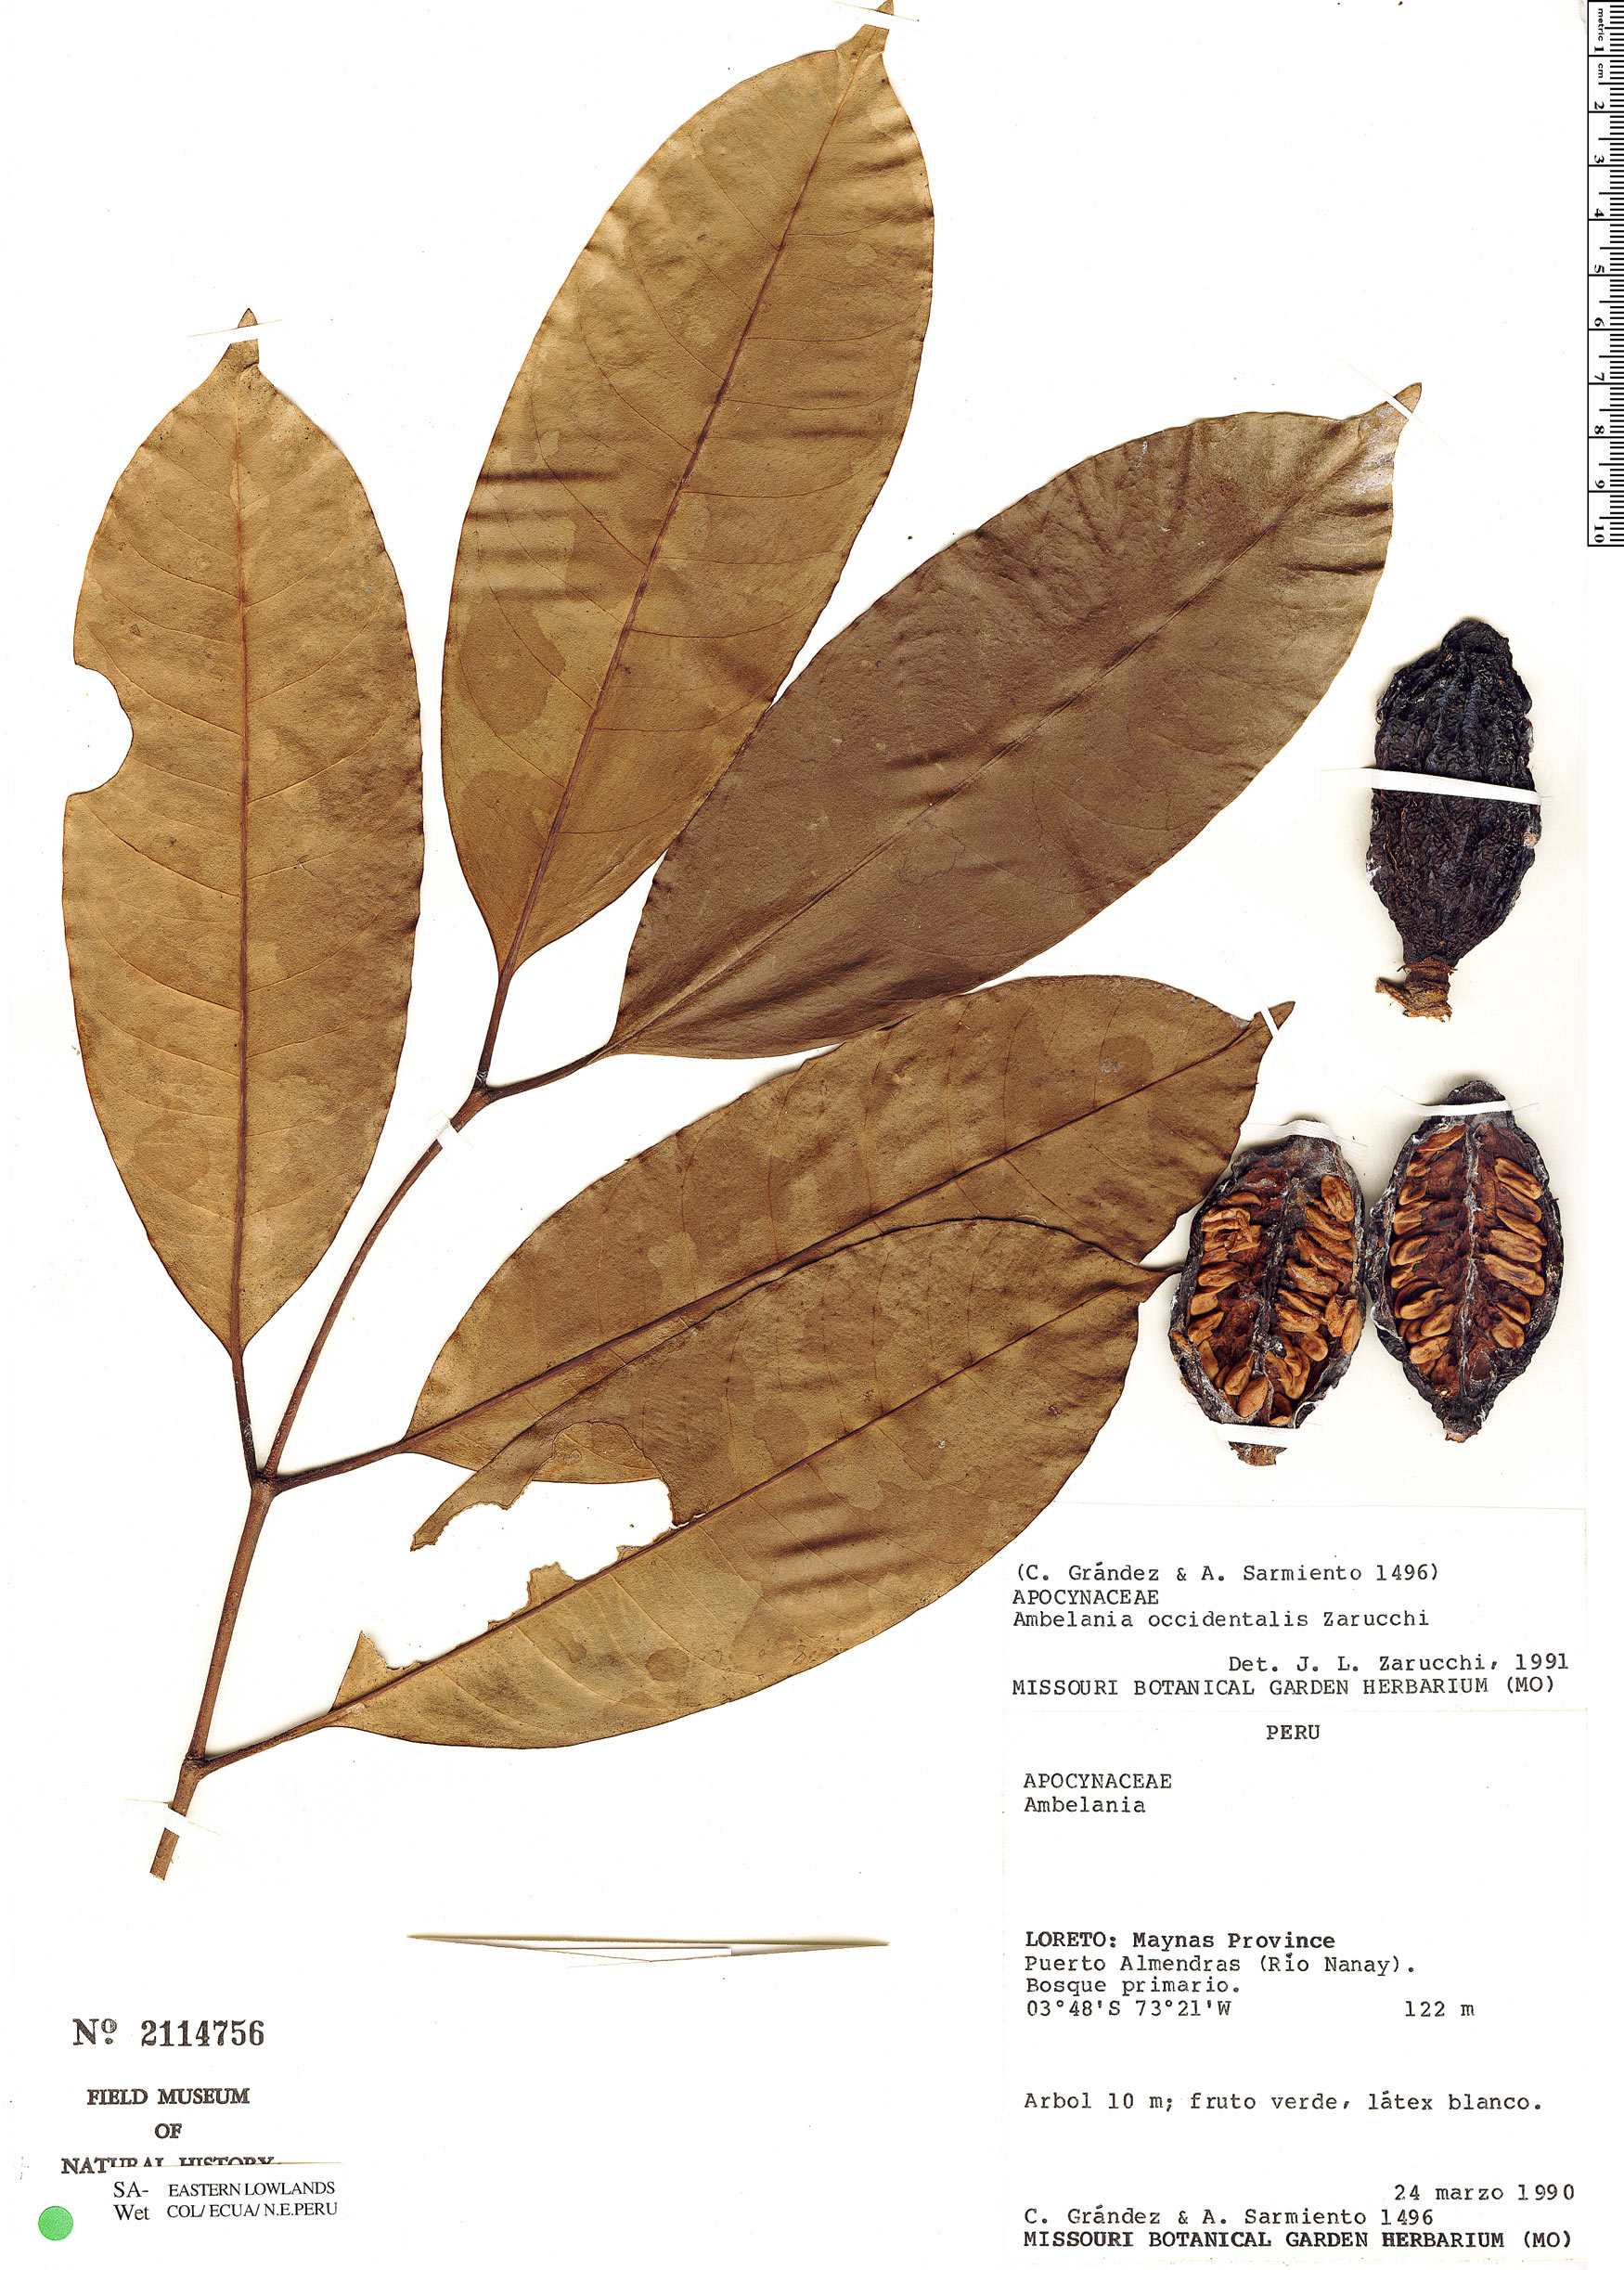 Specimen: Ambelania occidentalis